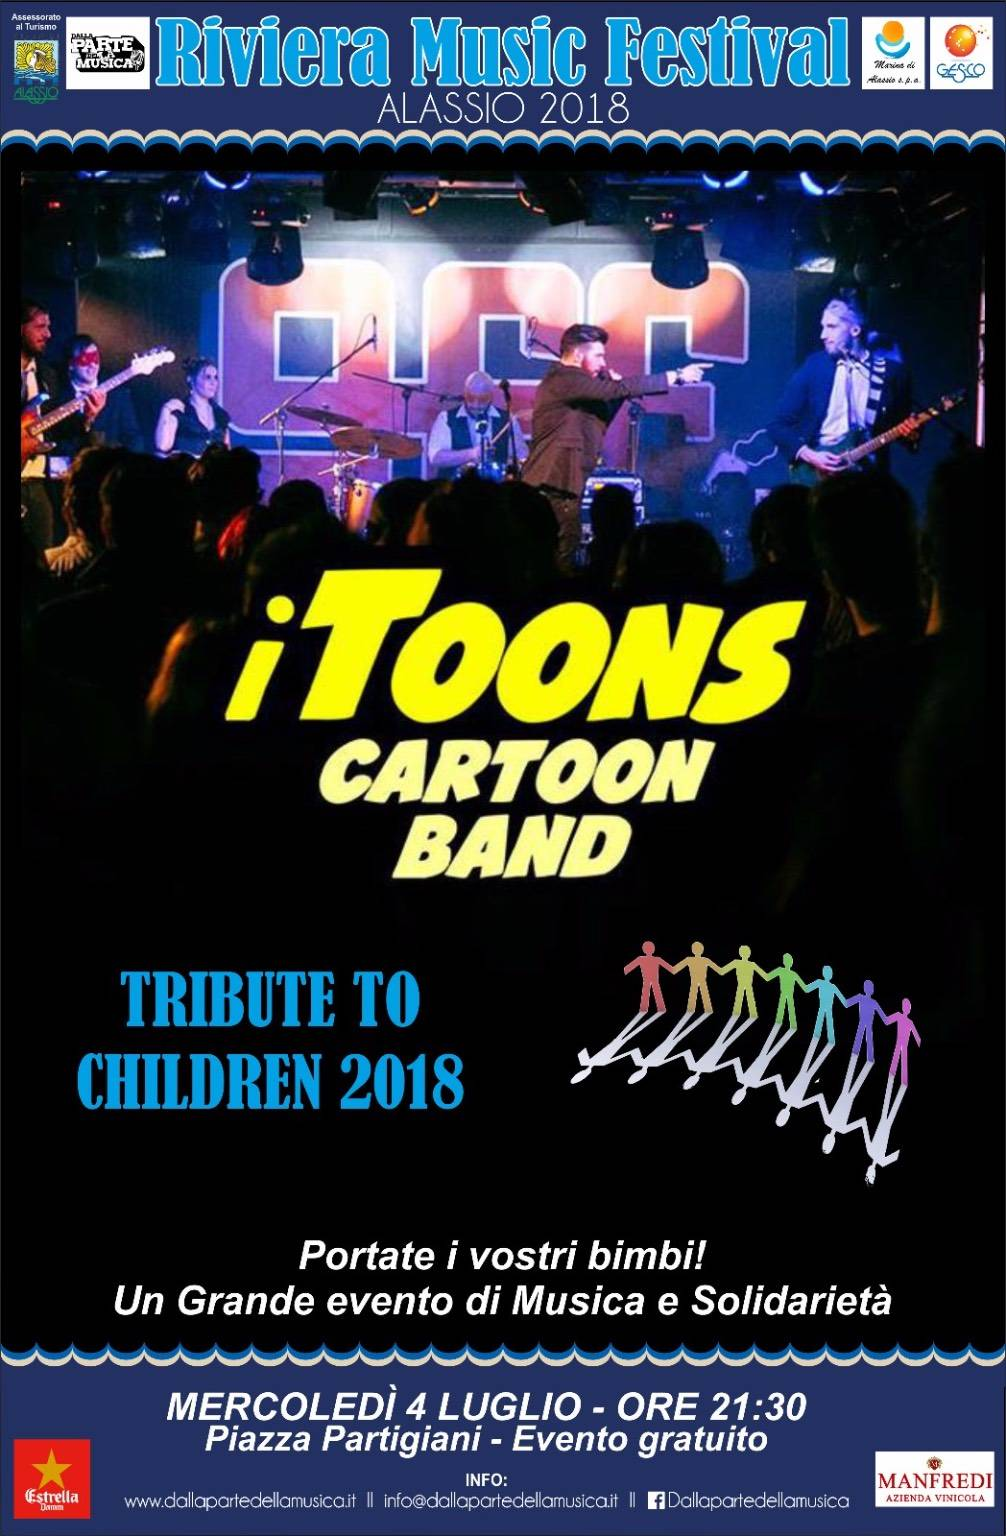 Itoons Cartoon Band Riviera Music Festival